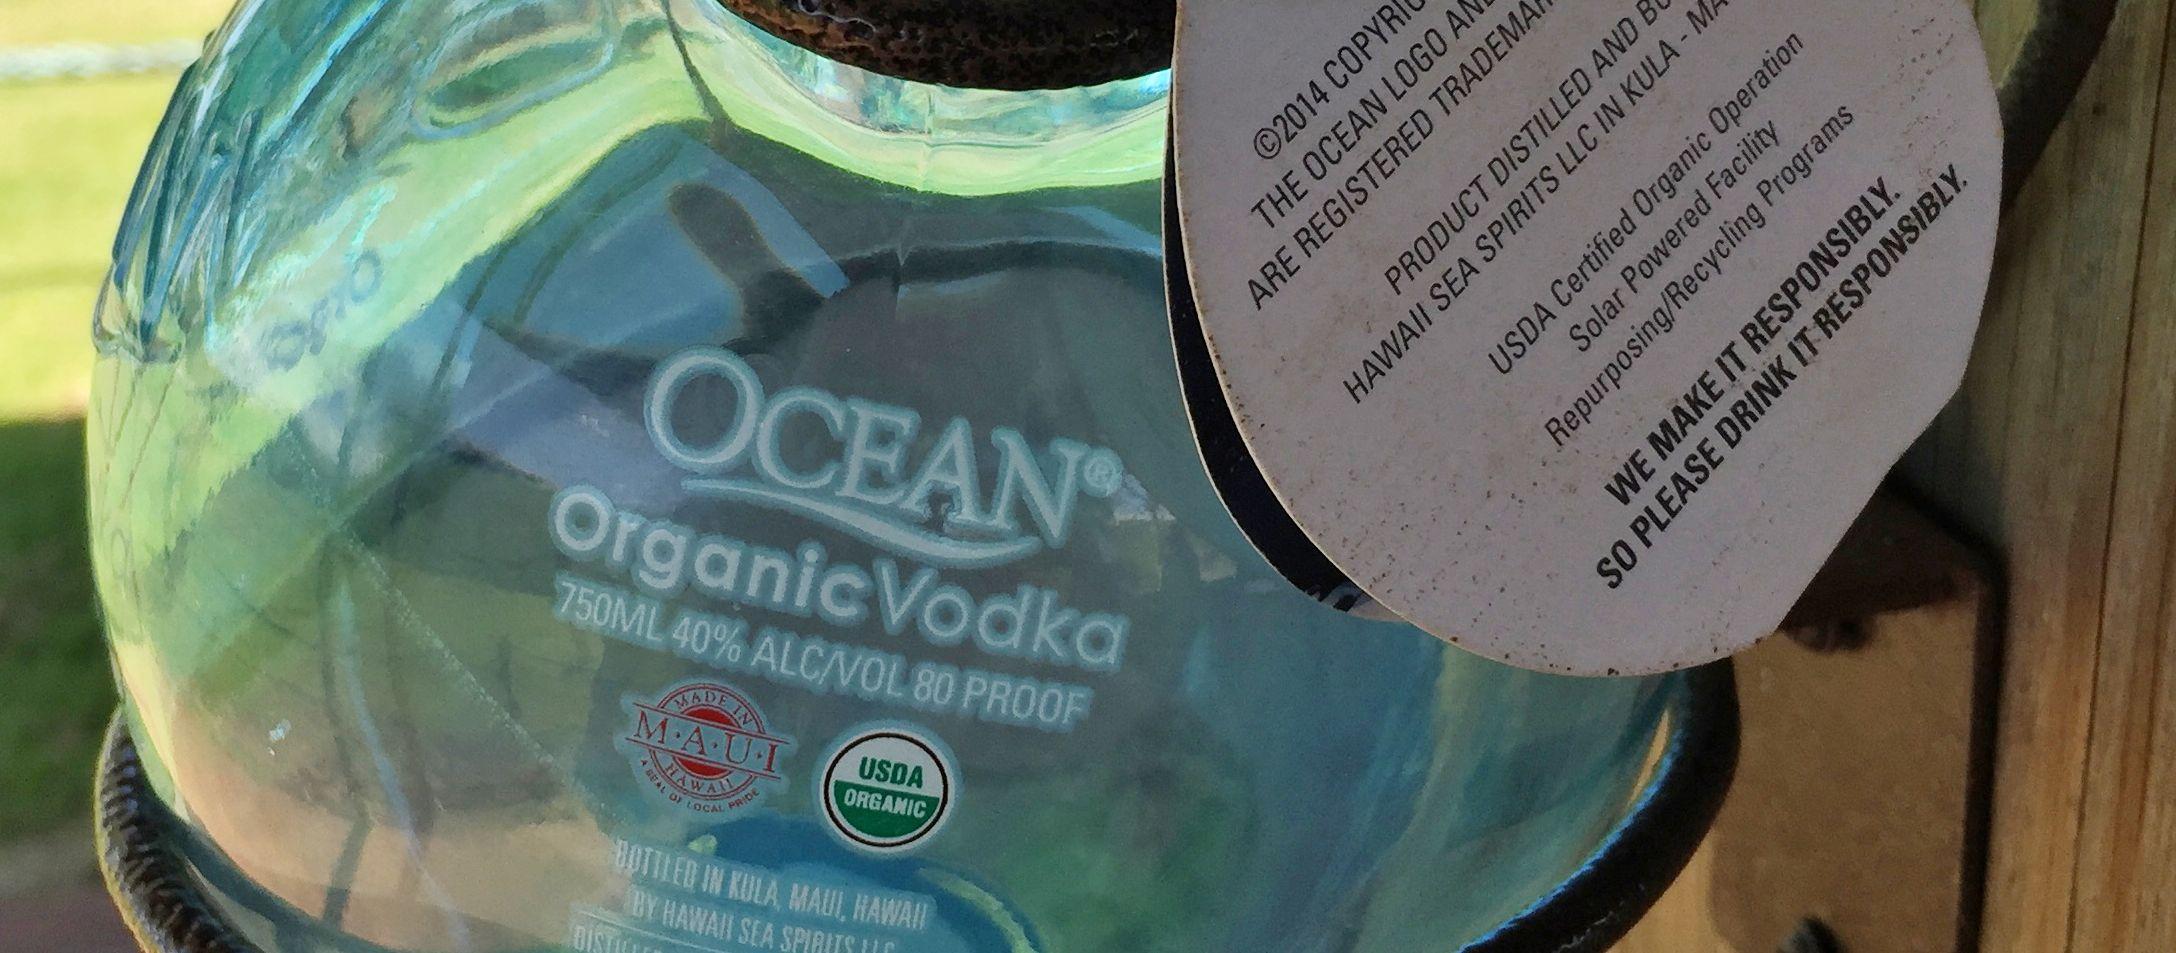 Organic Wodka